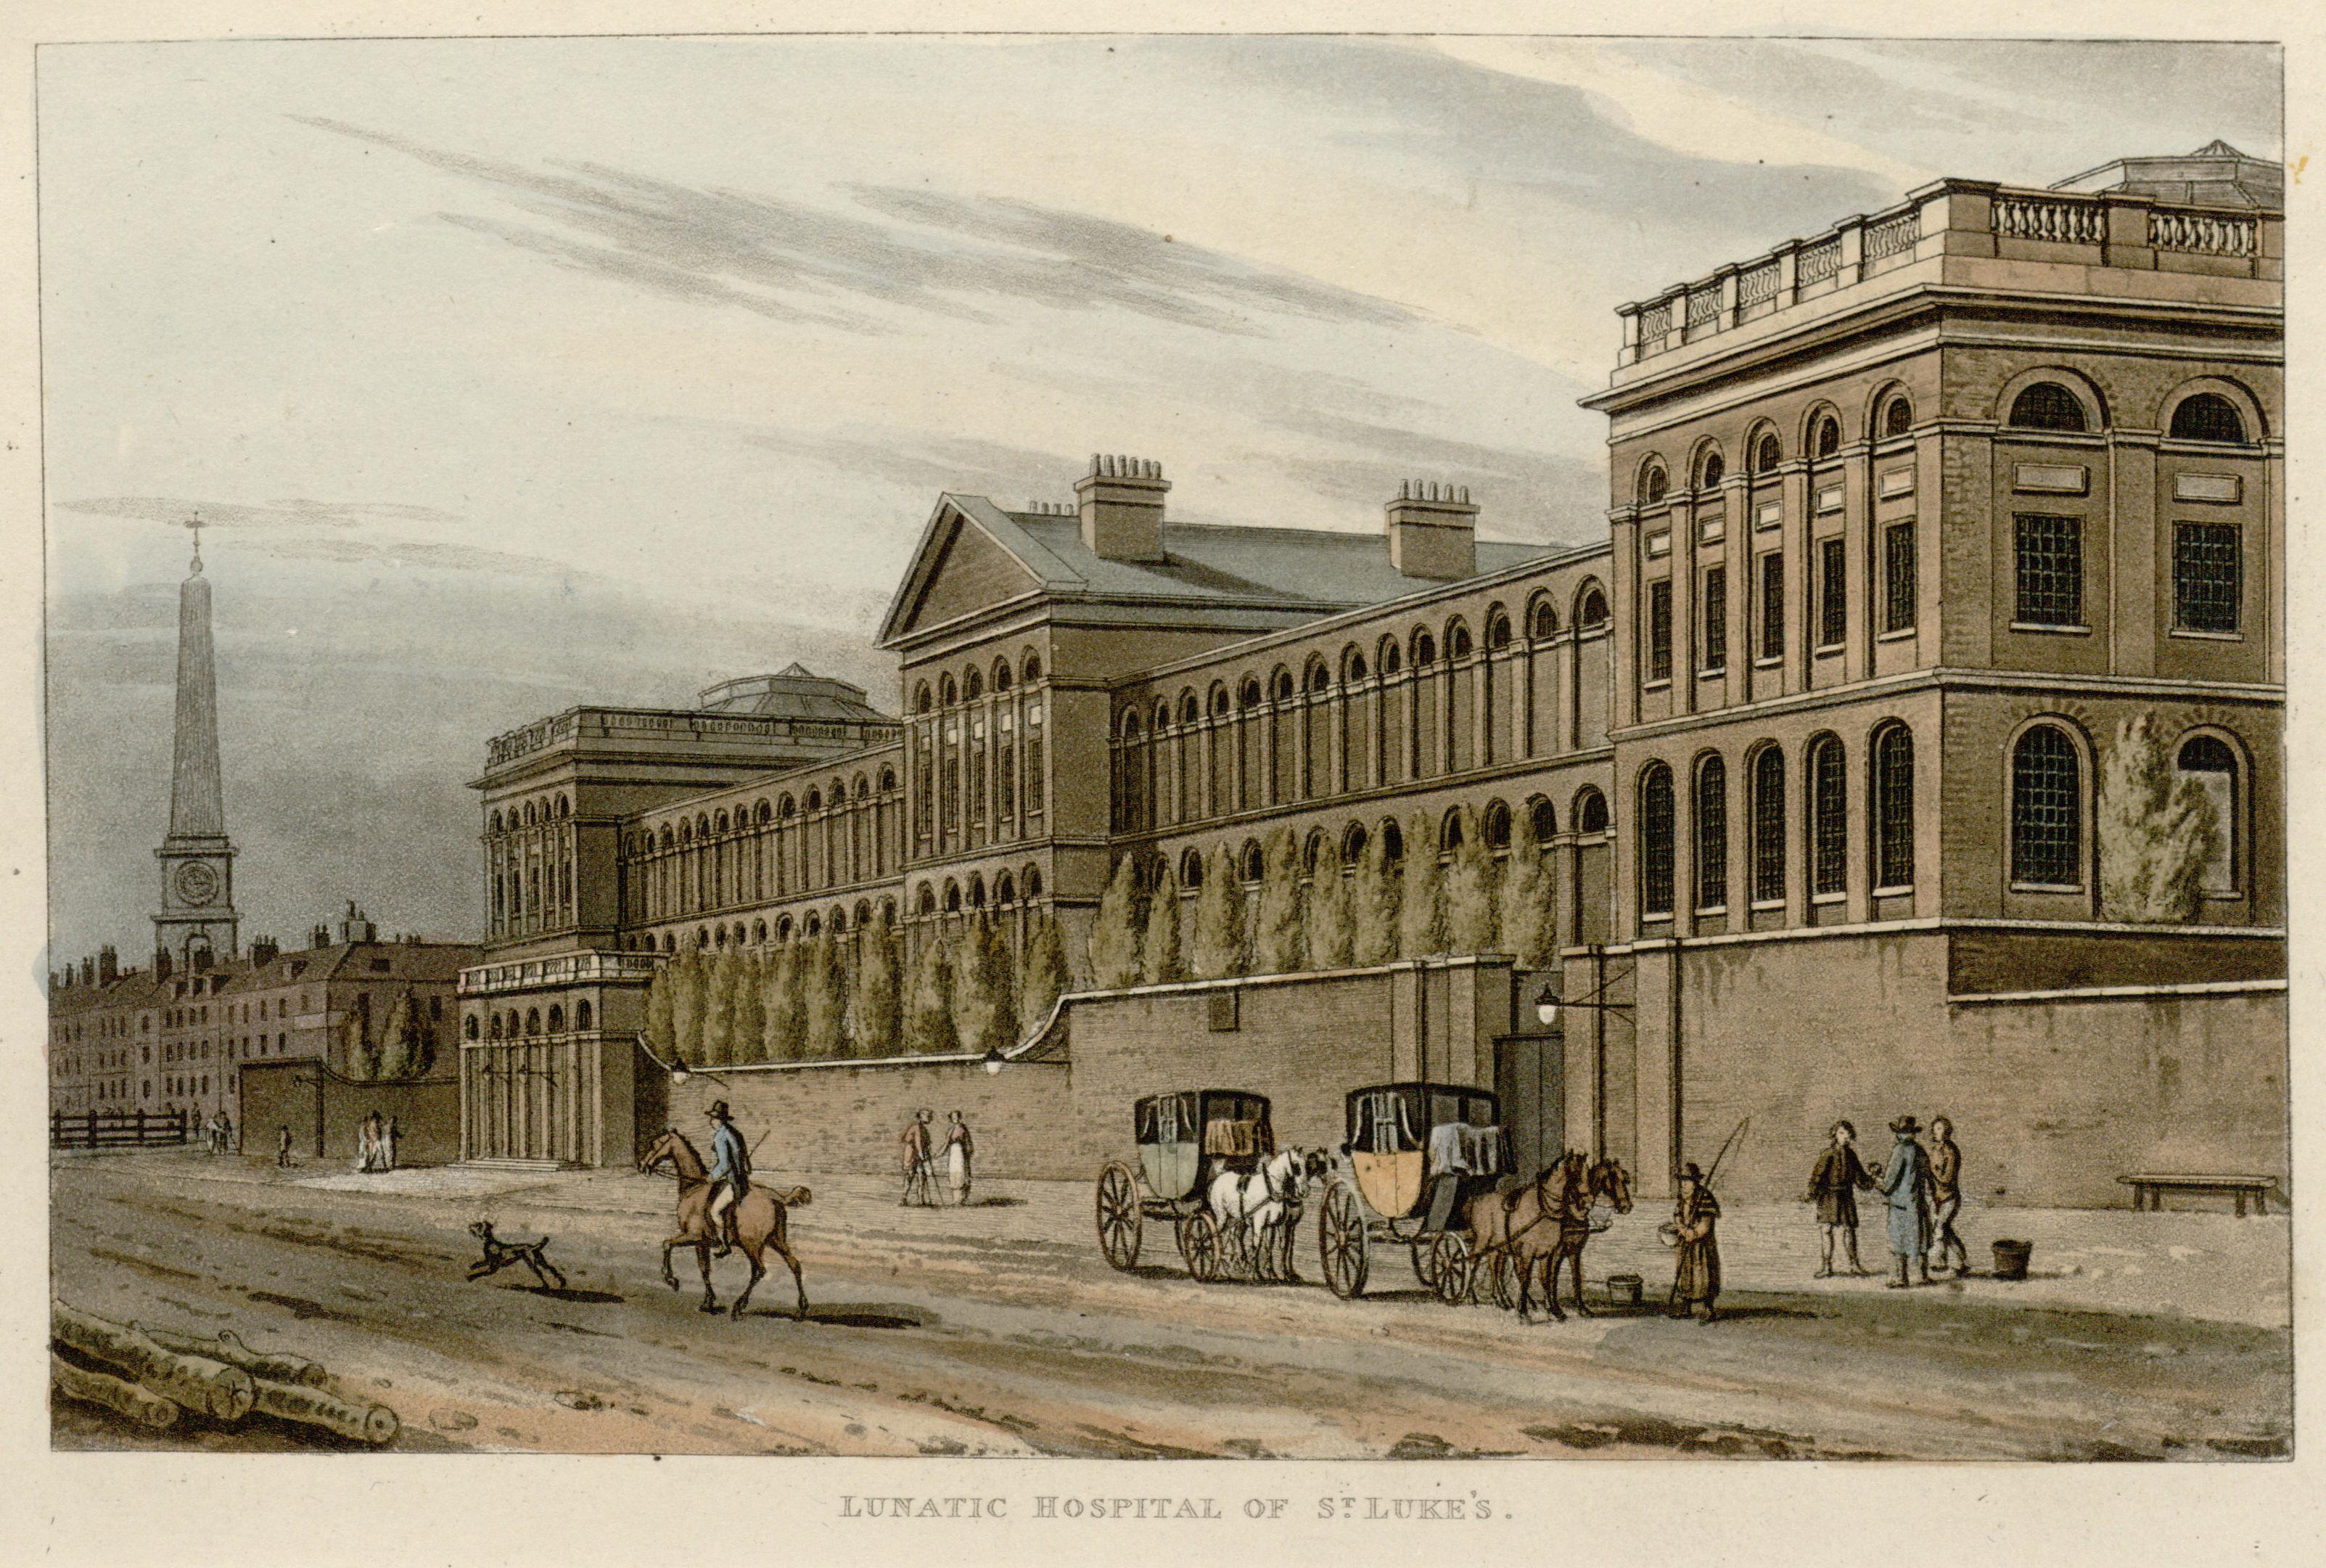 74 - Papworth - Lunatic Hospital of St Luke's